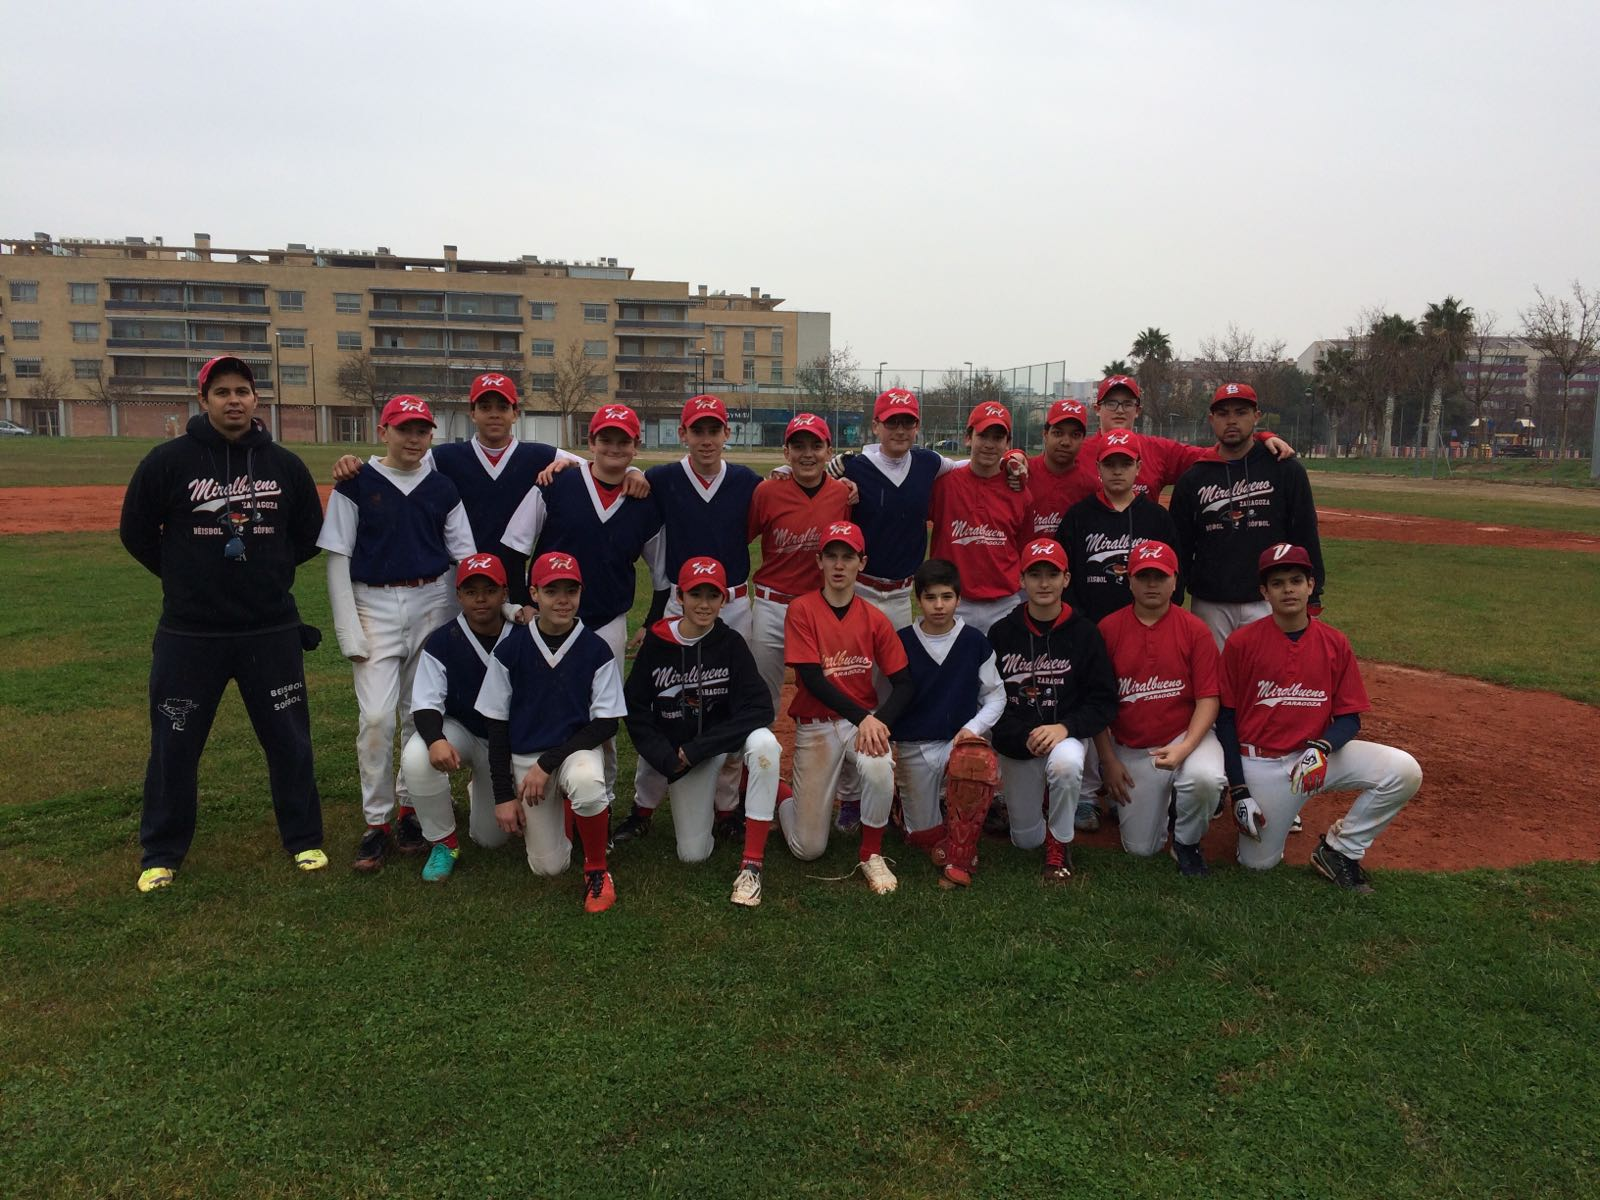 http://www.beisbolmiralbueno.es/wp-content/uploads/2017/02/liga-escolar-sub15-.jpg